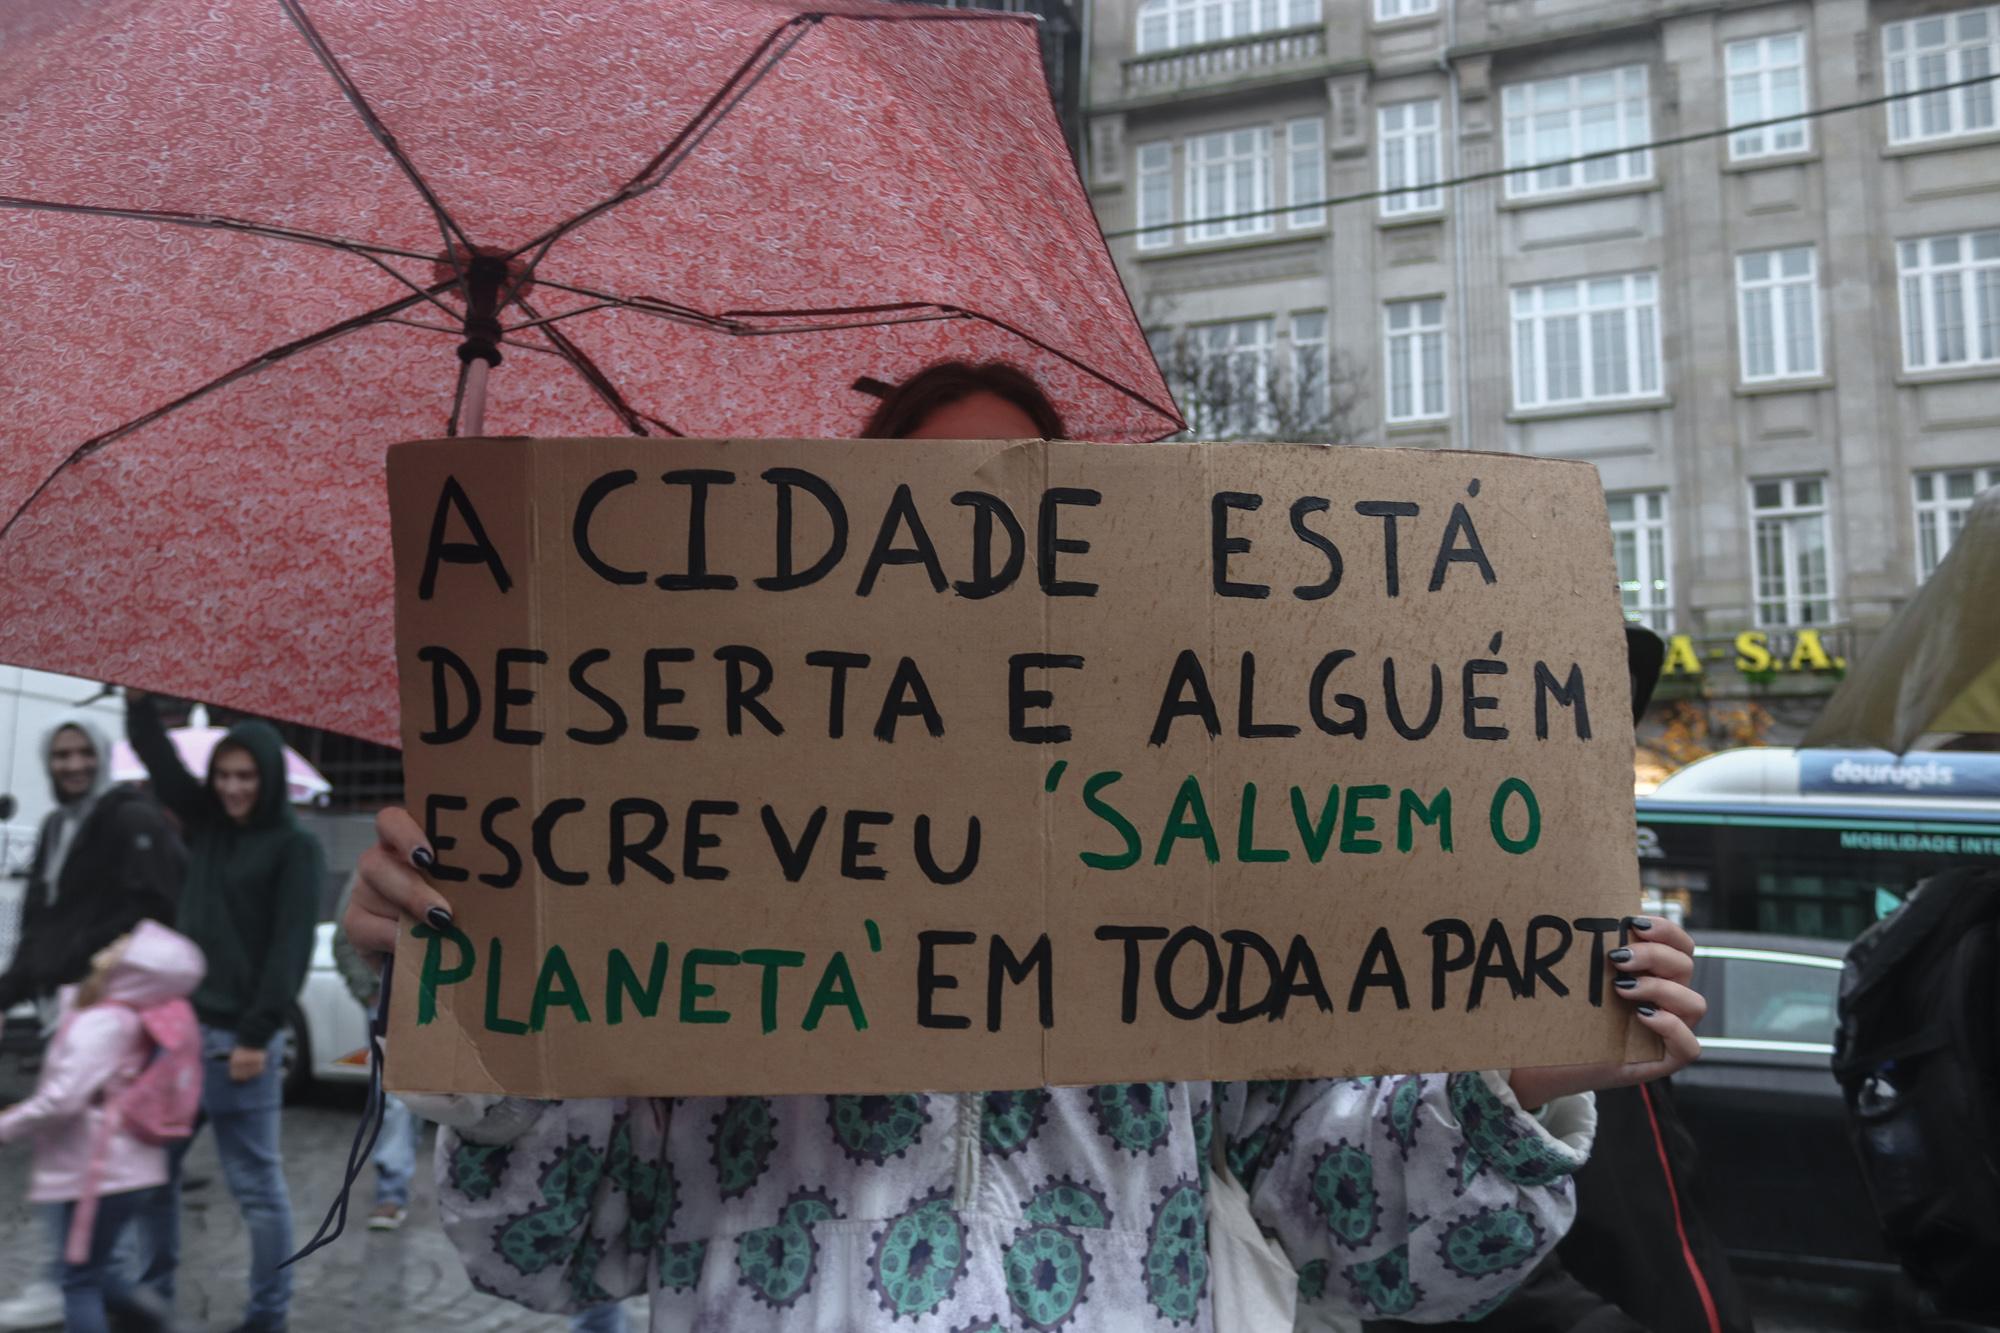 Fotografia de Salomé Santos